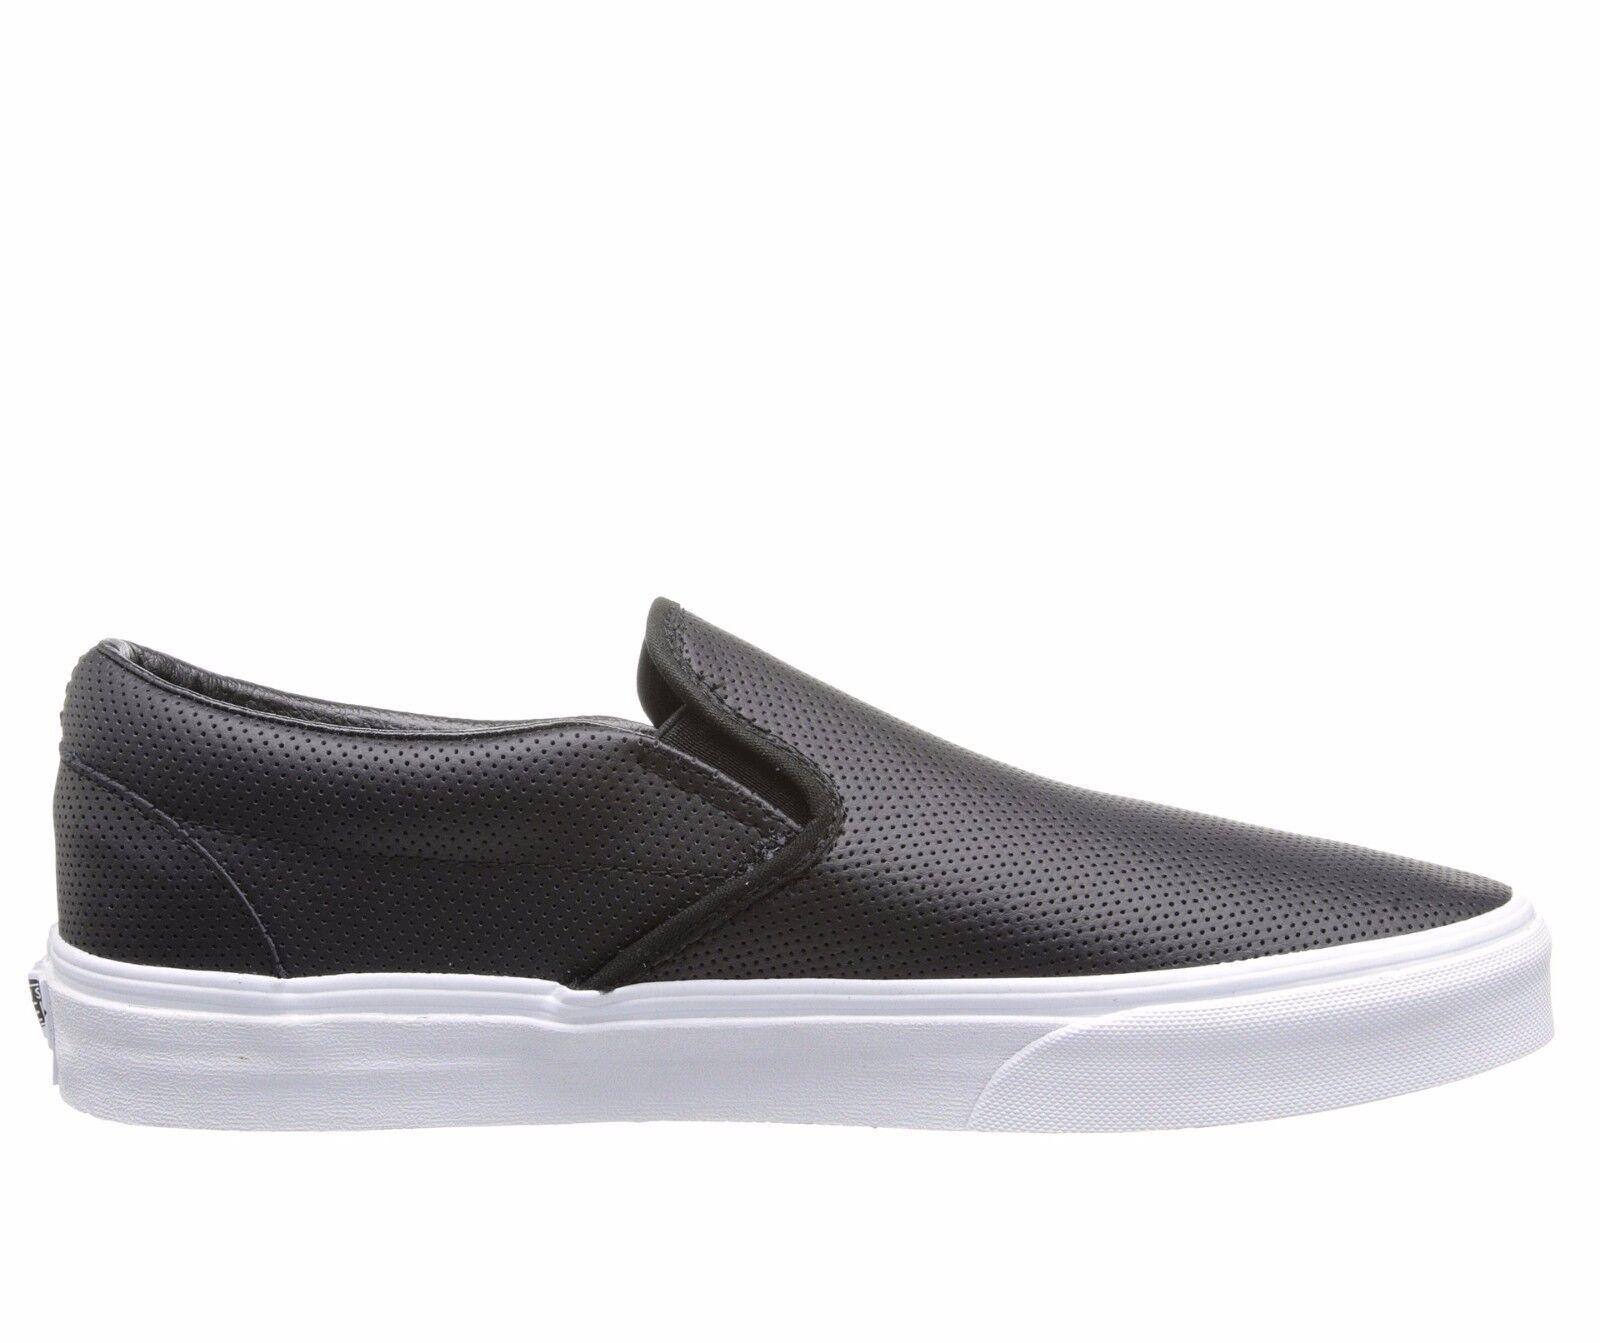 Men S Vans Classic Slip On Black Perf Leather Fashion